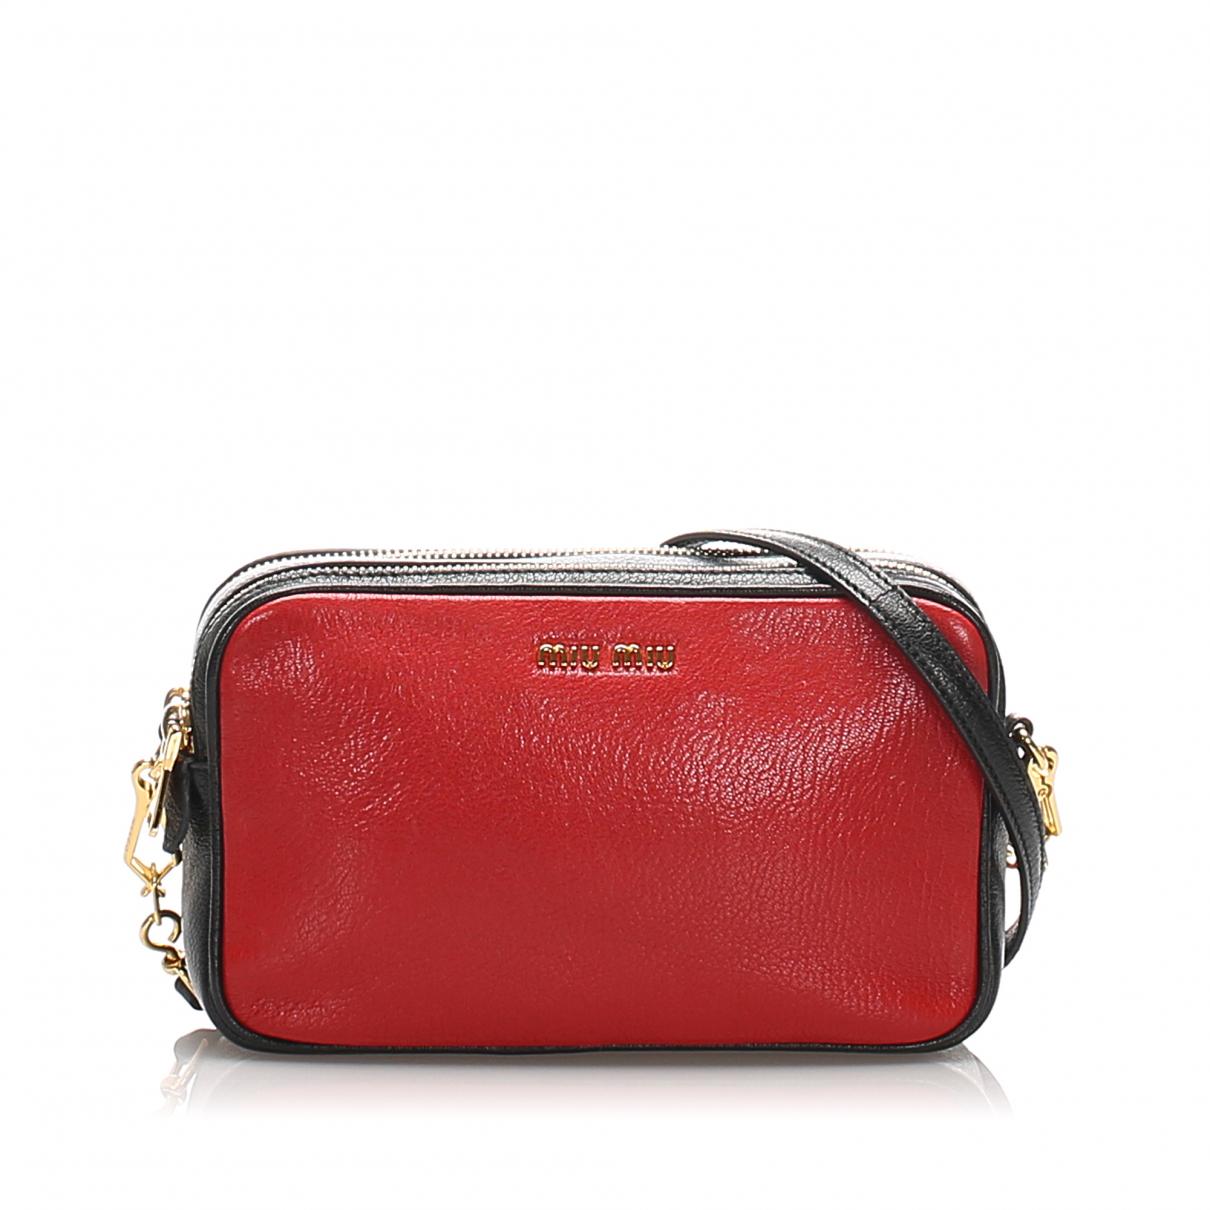 Miu Miu Madras Handtasche in  Rot Leder